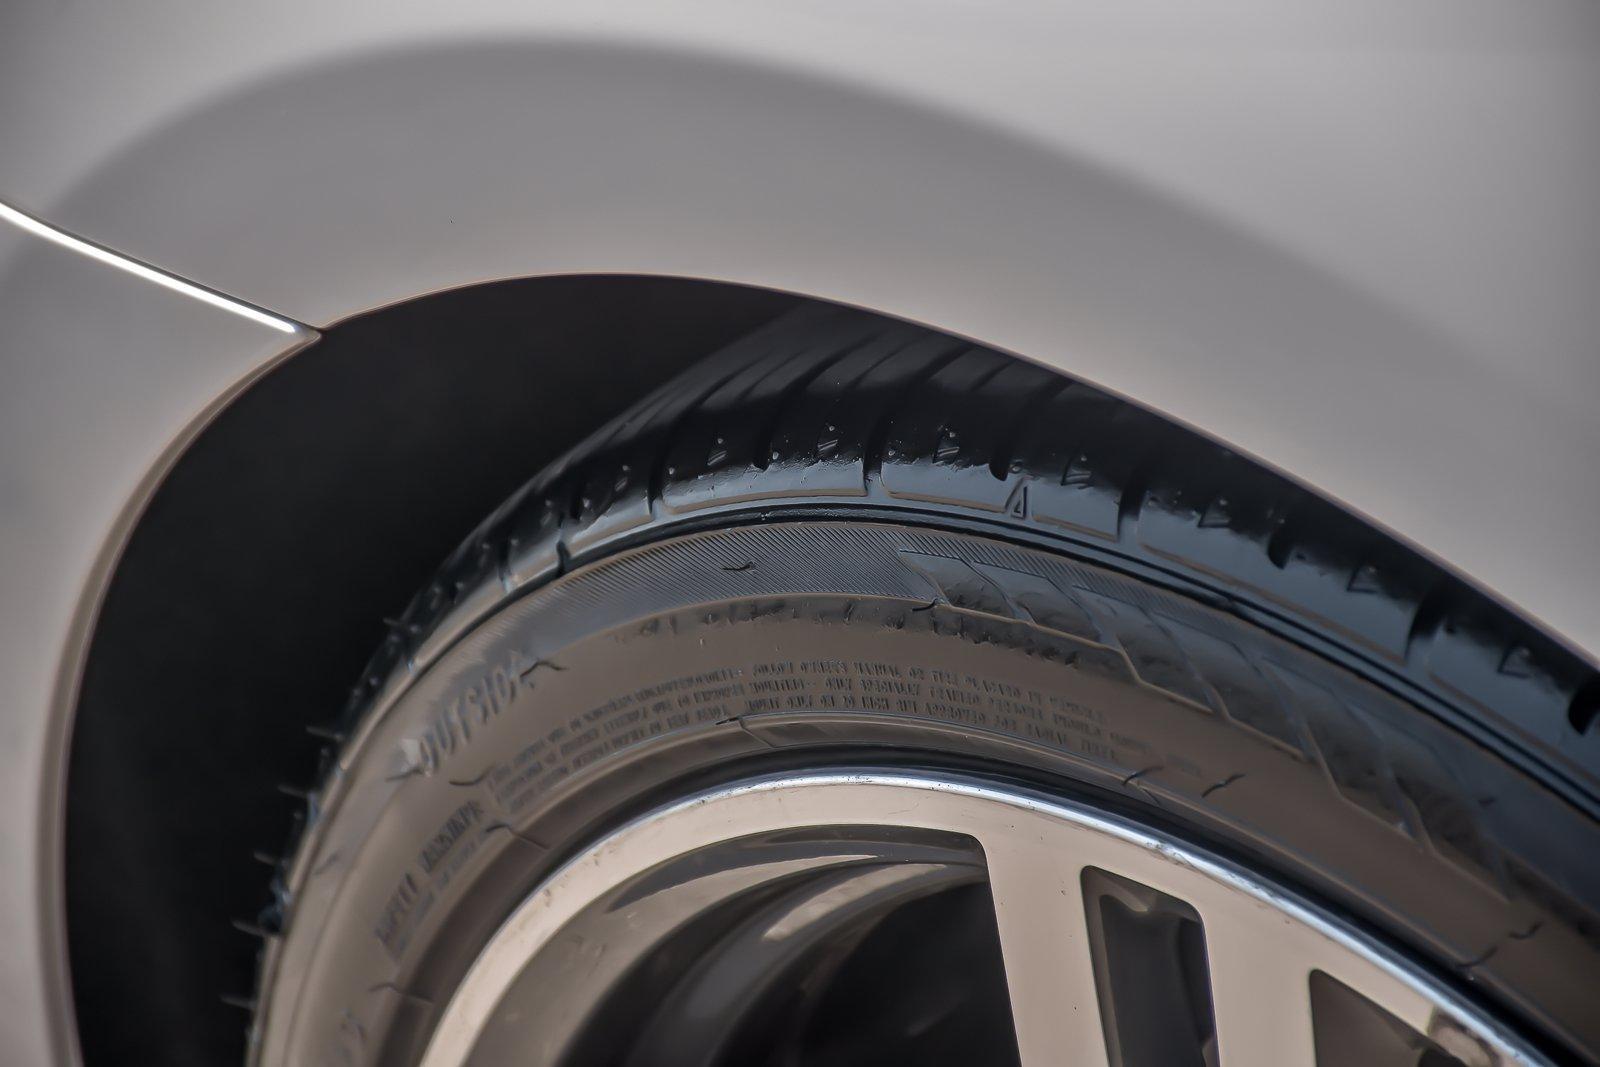 Used 2019 BMW 7 Series 750i xDrive M-Sport | Downers Grove, IL